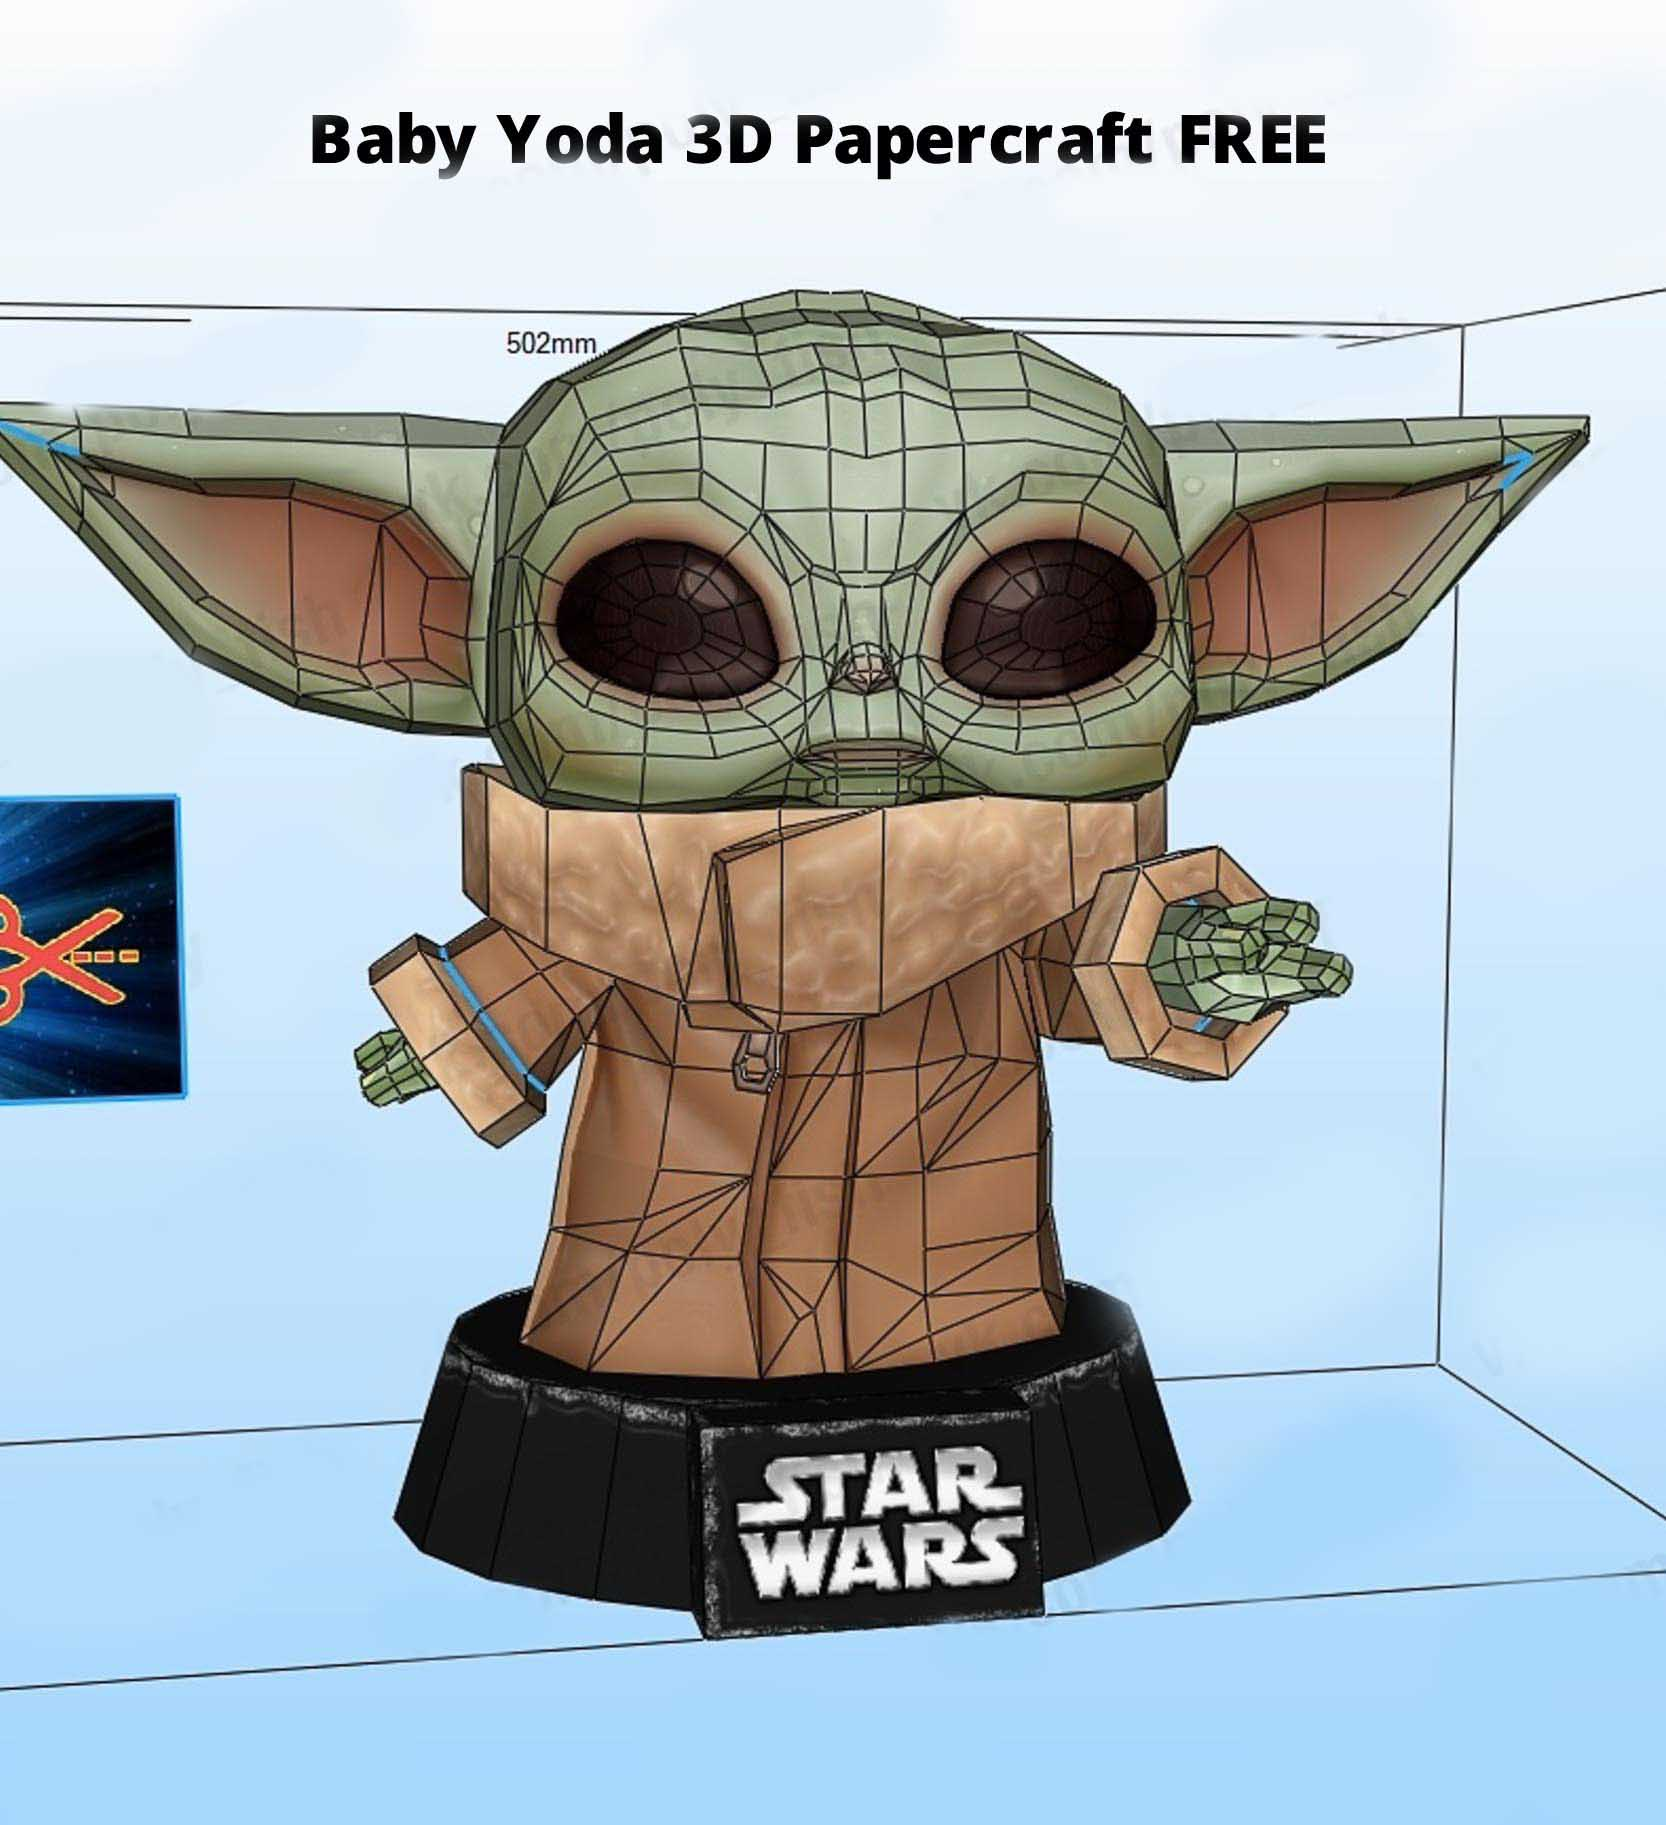 Baby Yoda 3D Papercraft Free